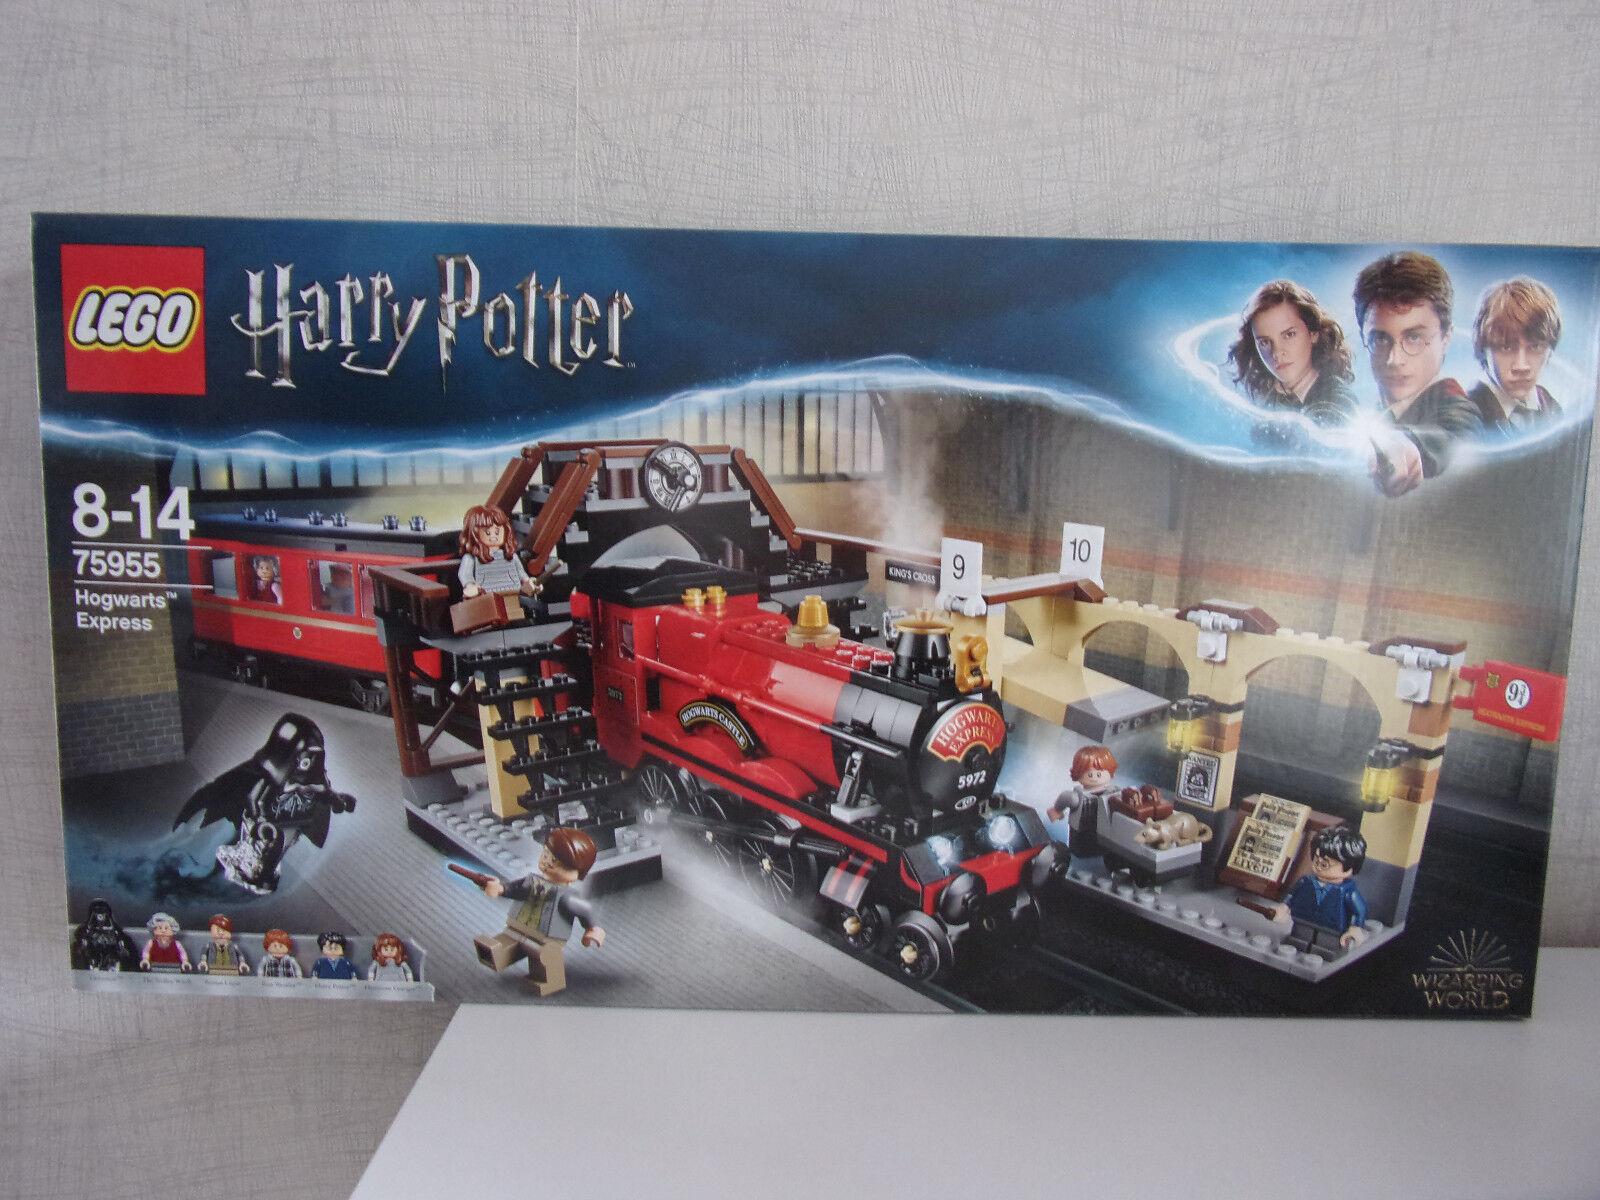 Lego Harry Potter 75955 Hogwarts Express-nuevo & OVP